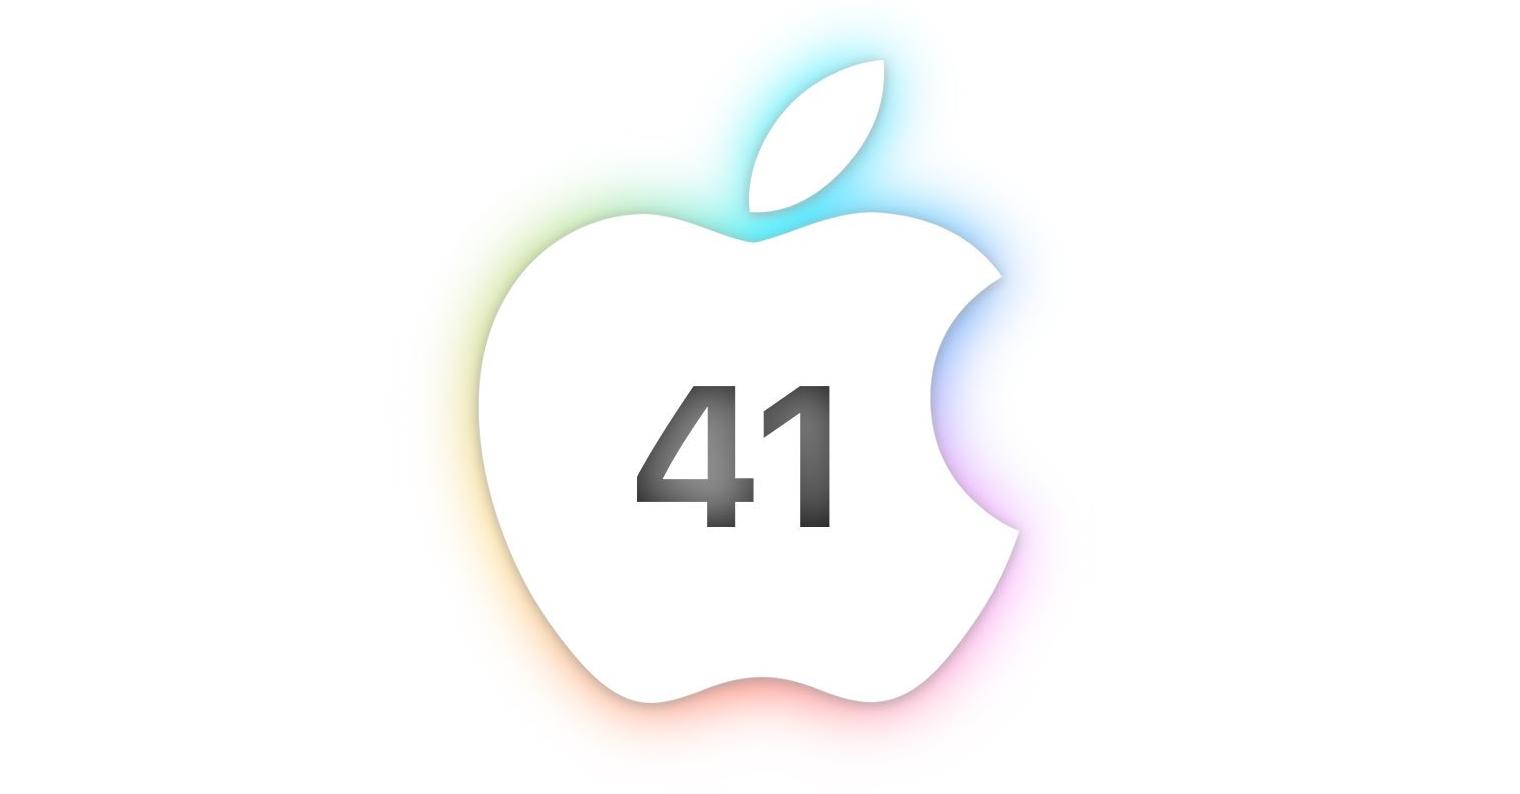 Apple 41 years